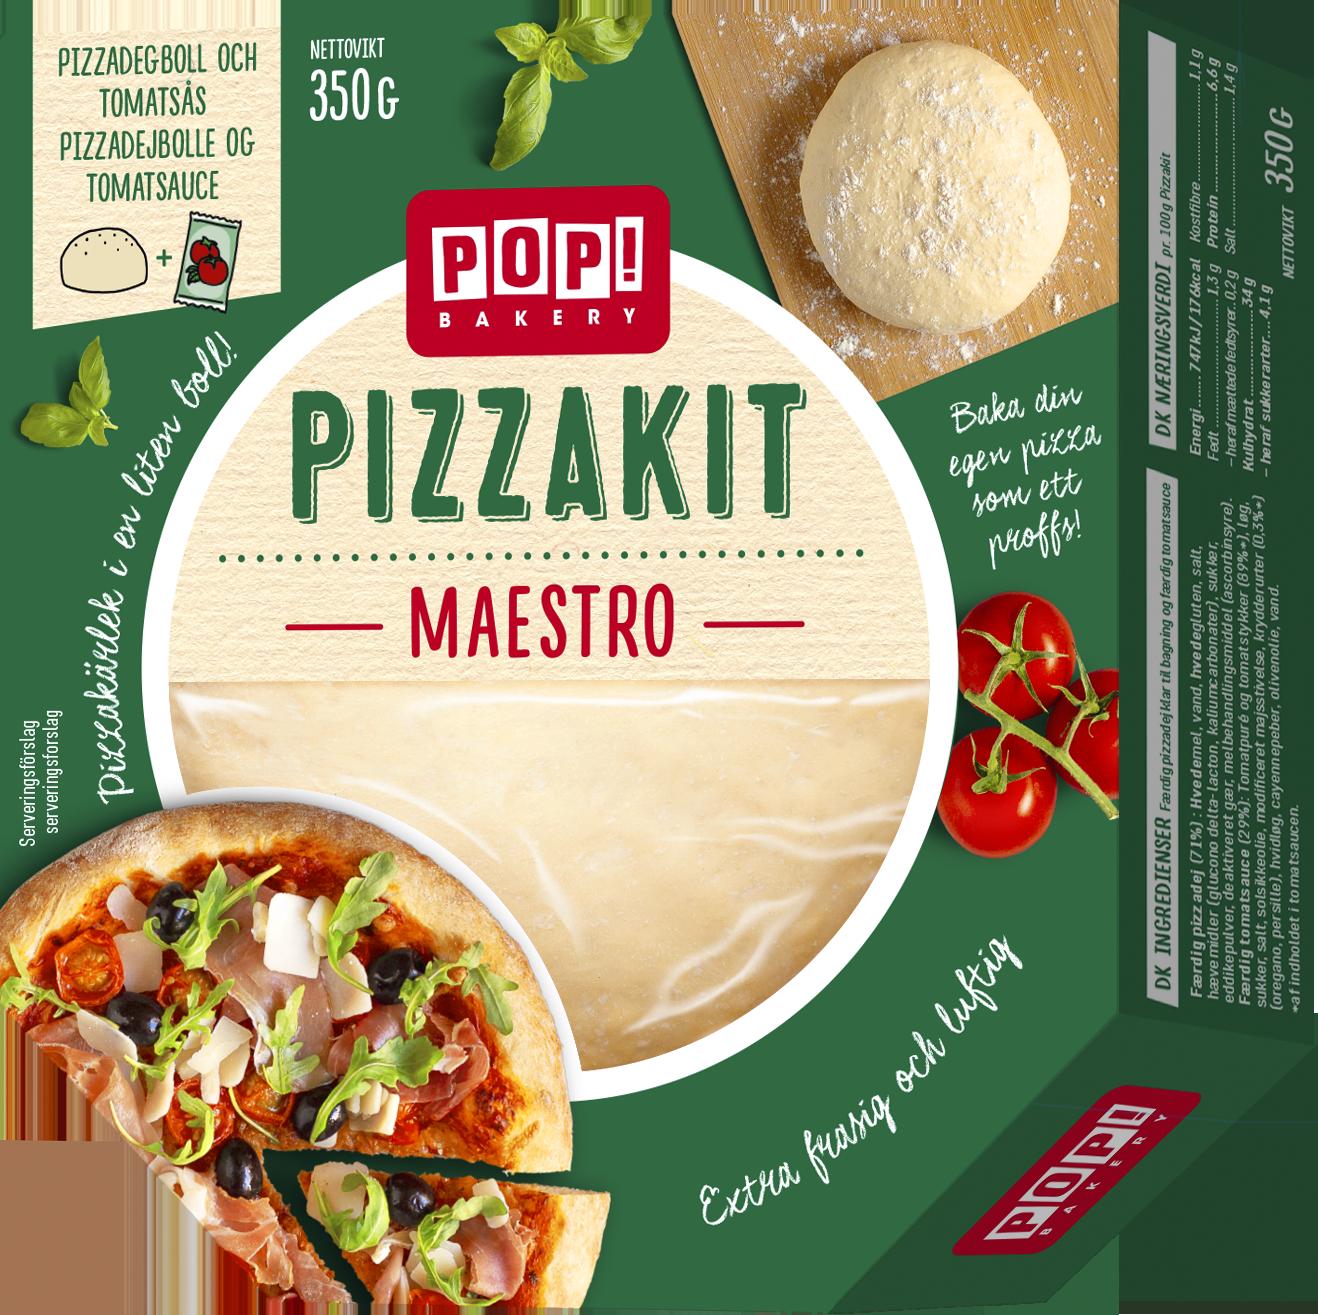 pizzakit maestro